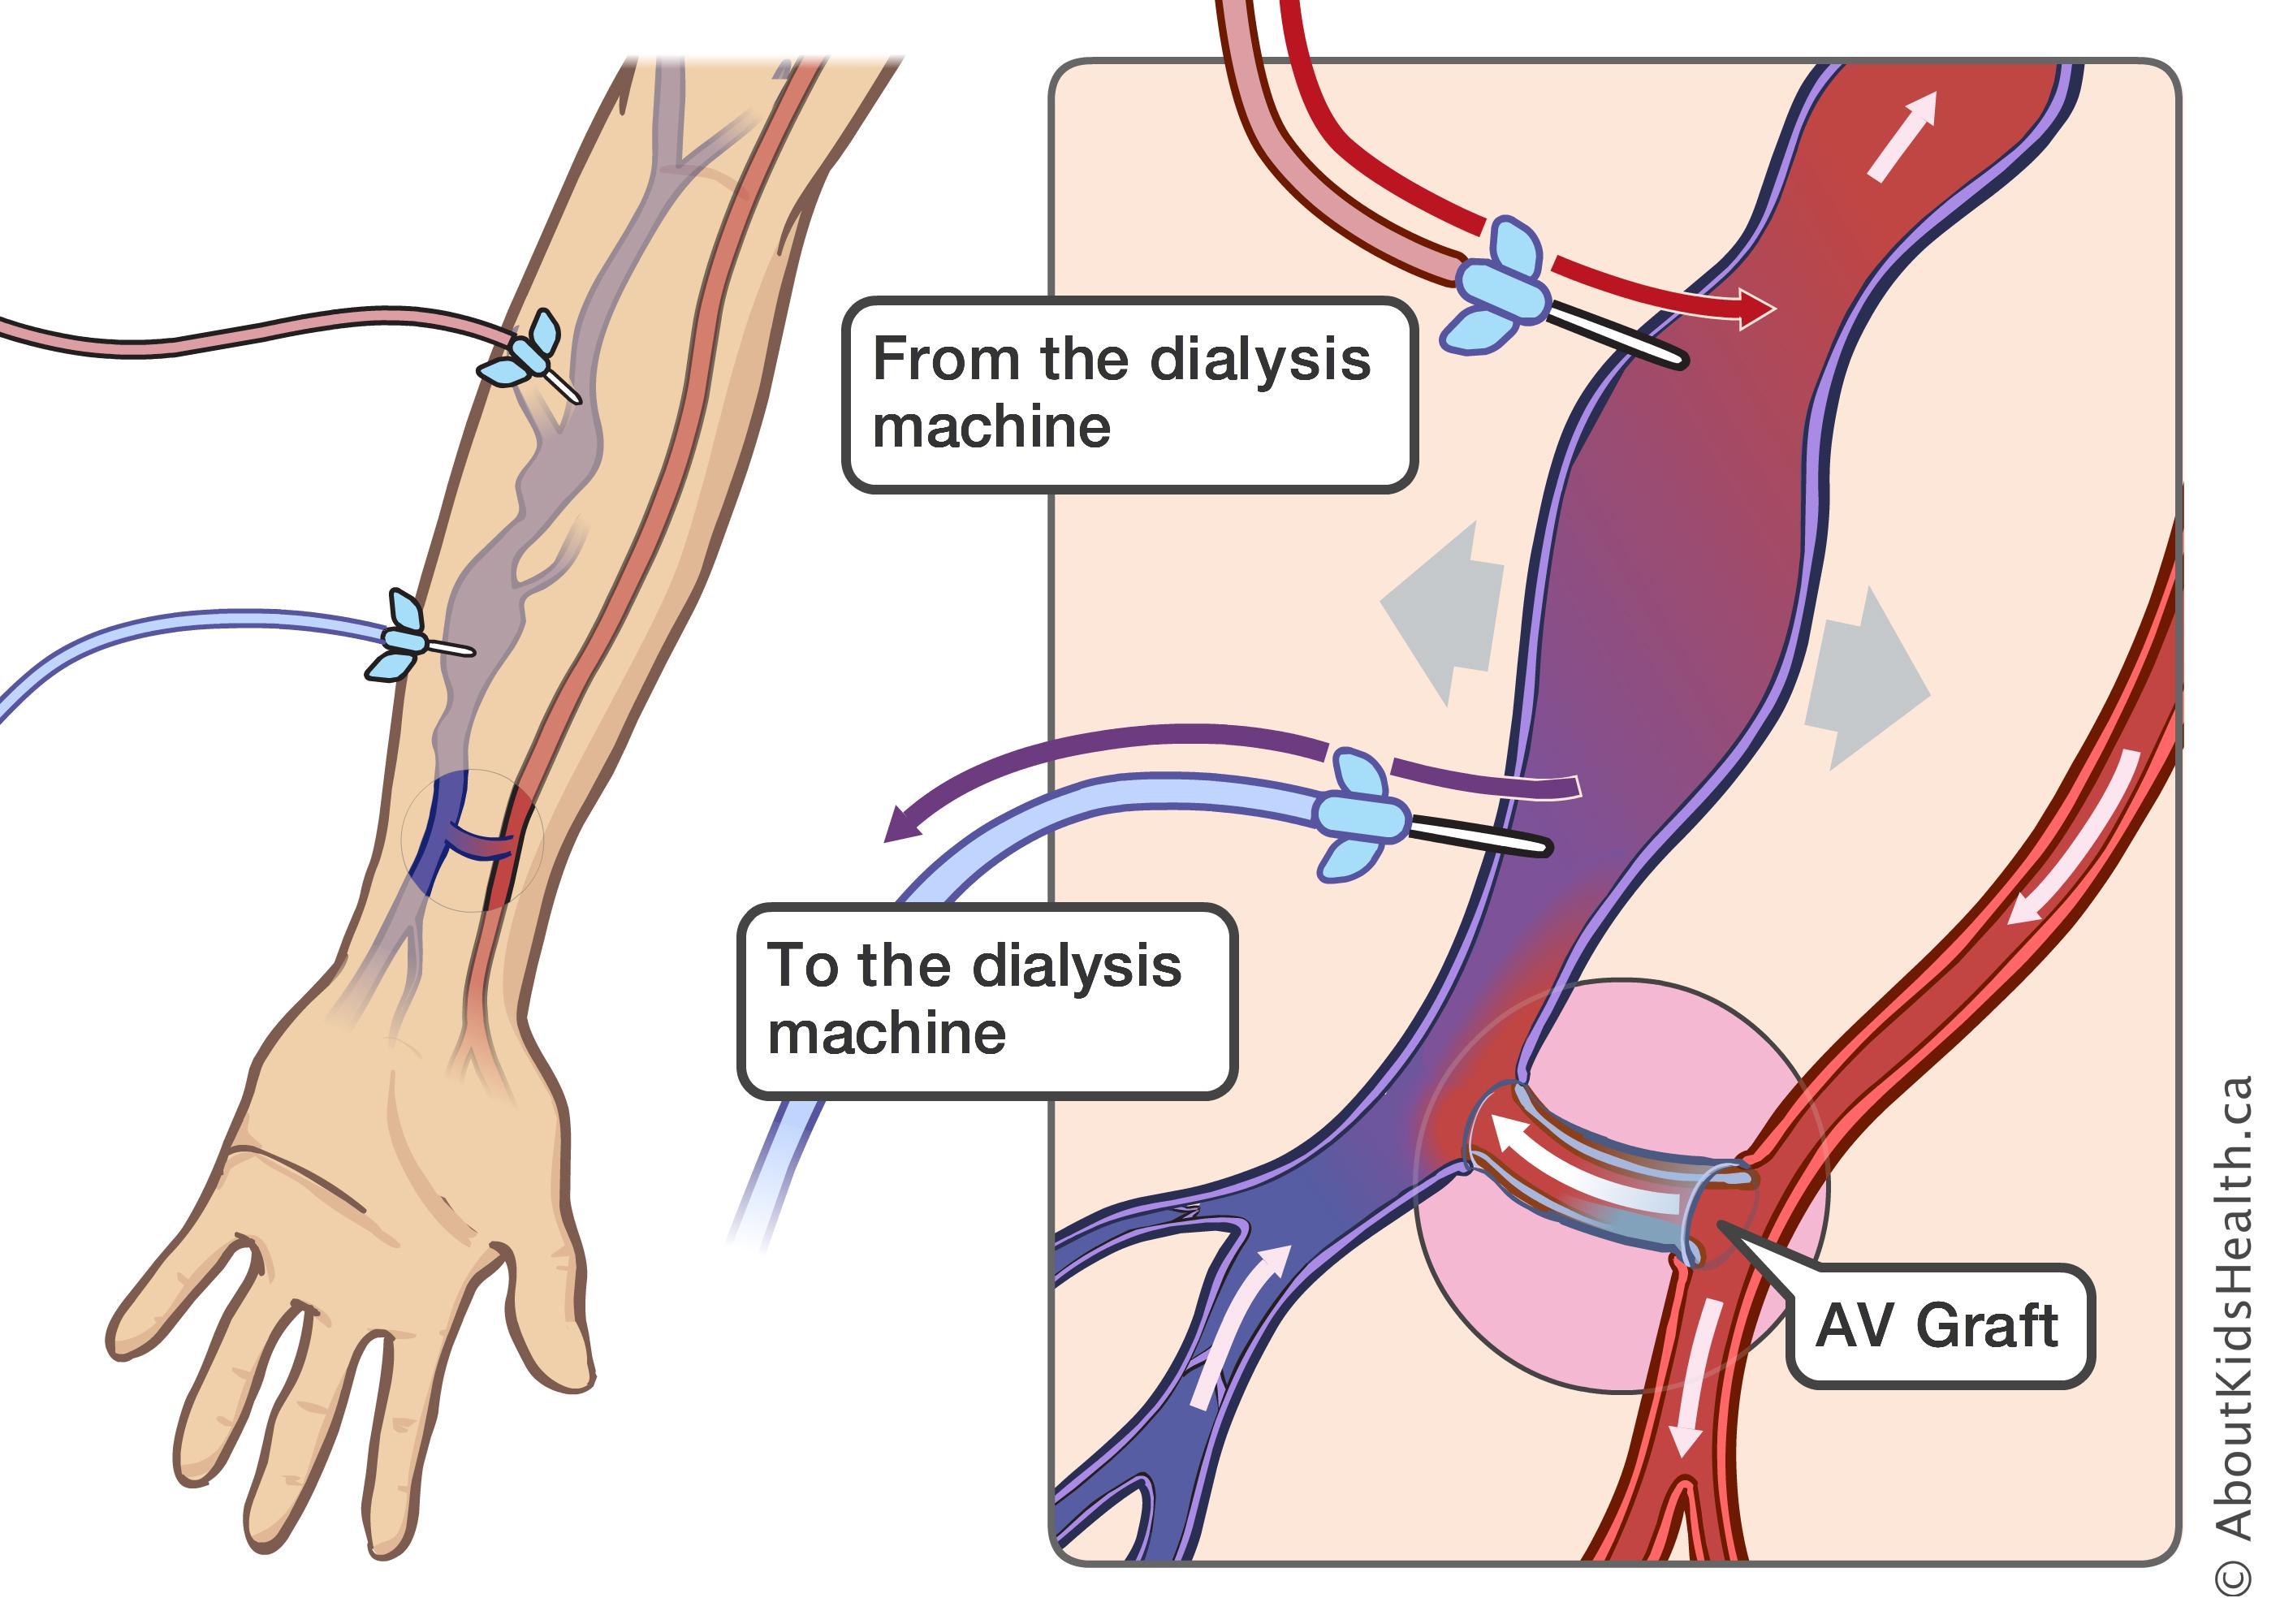 diagram of veins in wrist babies wiring diagrams thumbs Hand Veins in Wrist and All Names diagram of veins in wrist babies wiring database library wrist veins and arteries diagram of veins in wrist babies